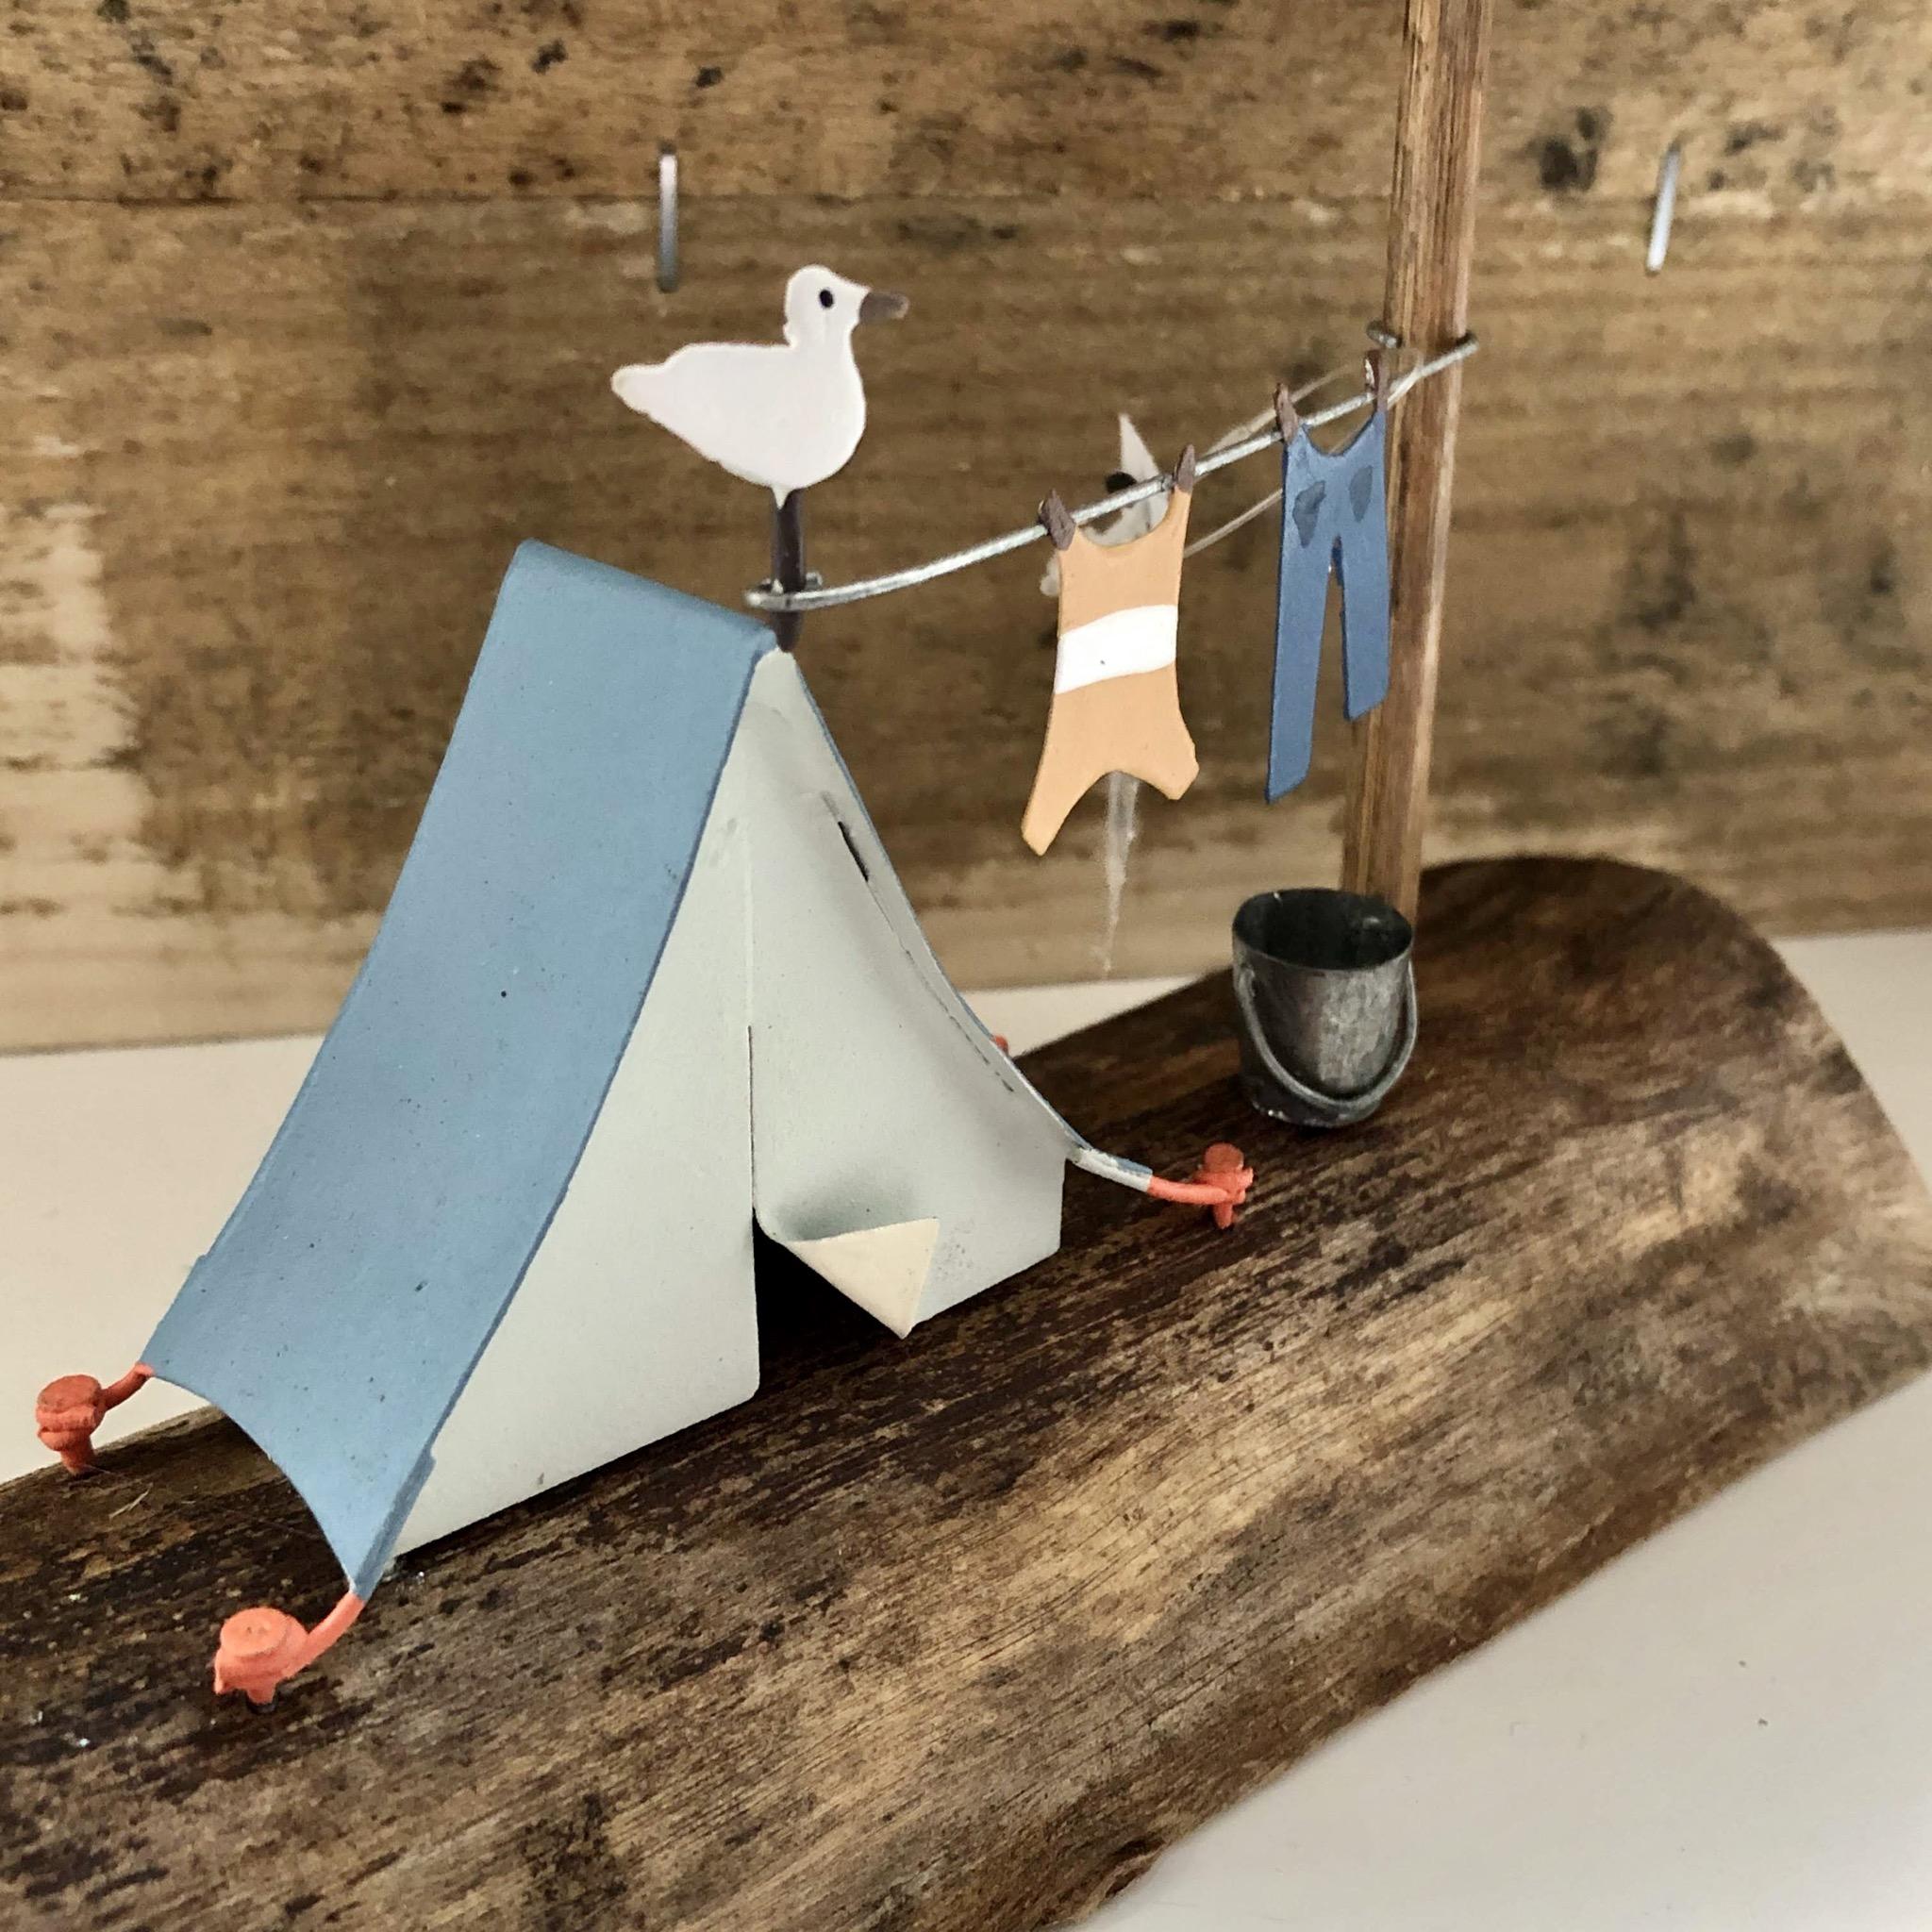 Seaside camp. Retro blue tent ornament by shoeless joe